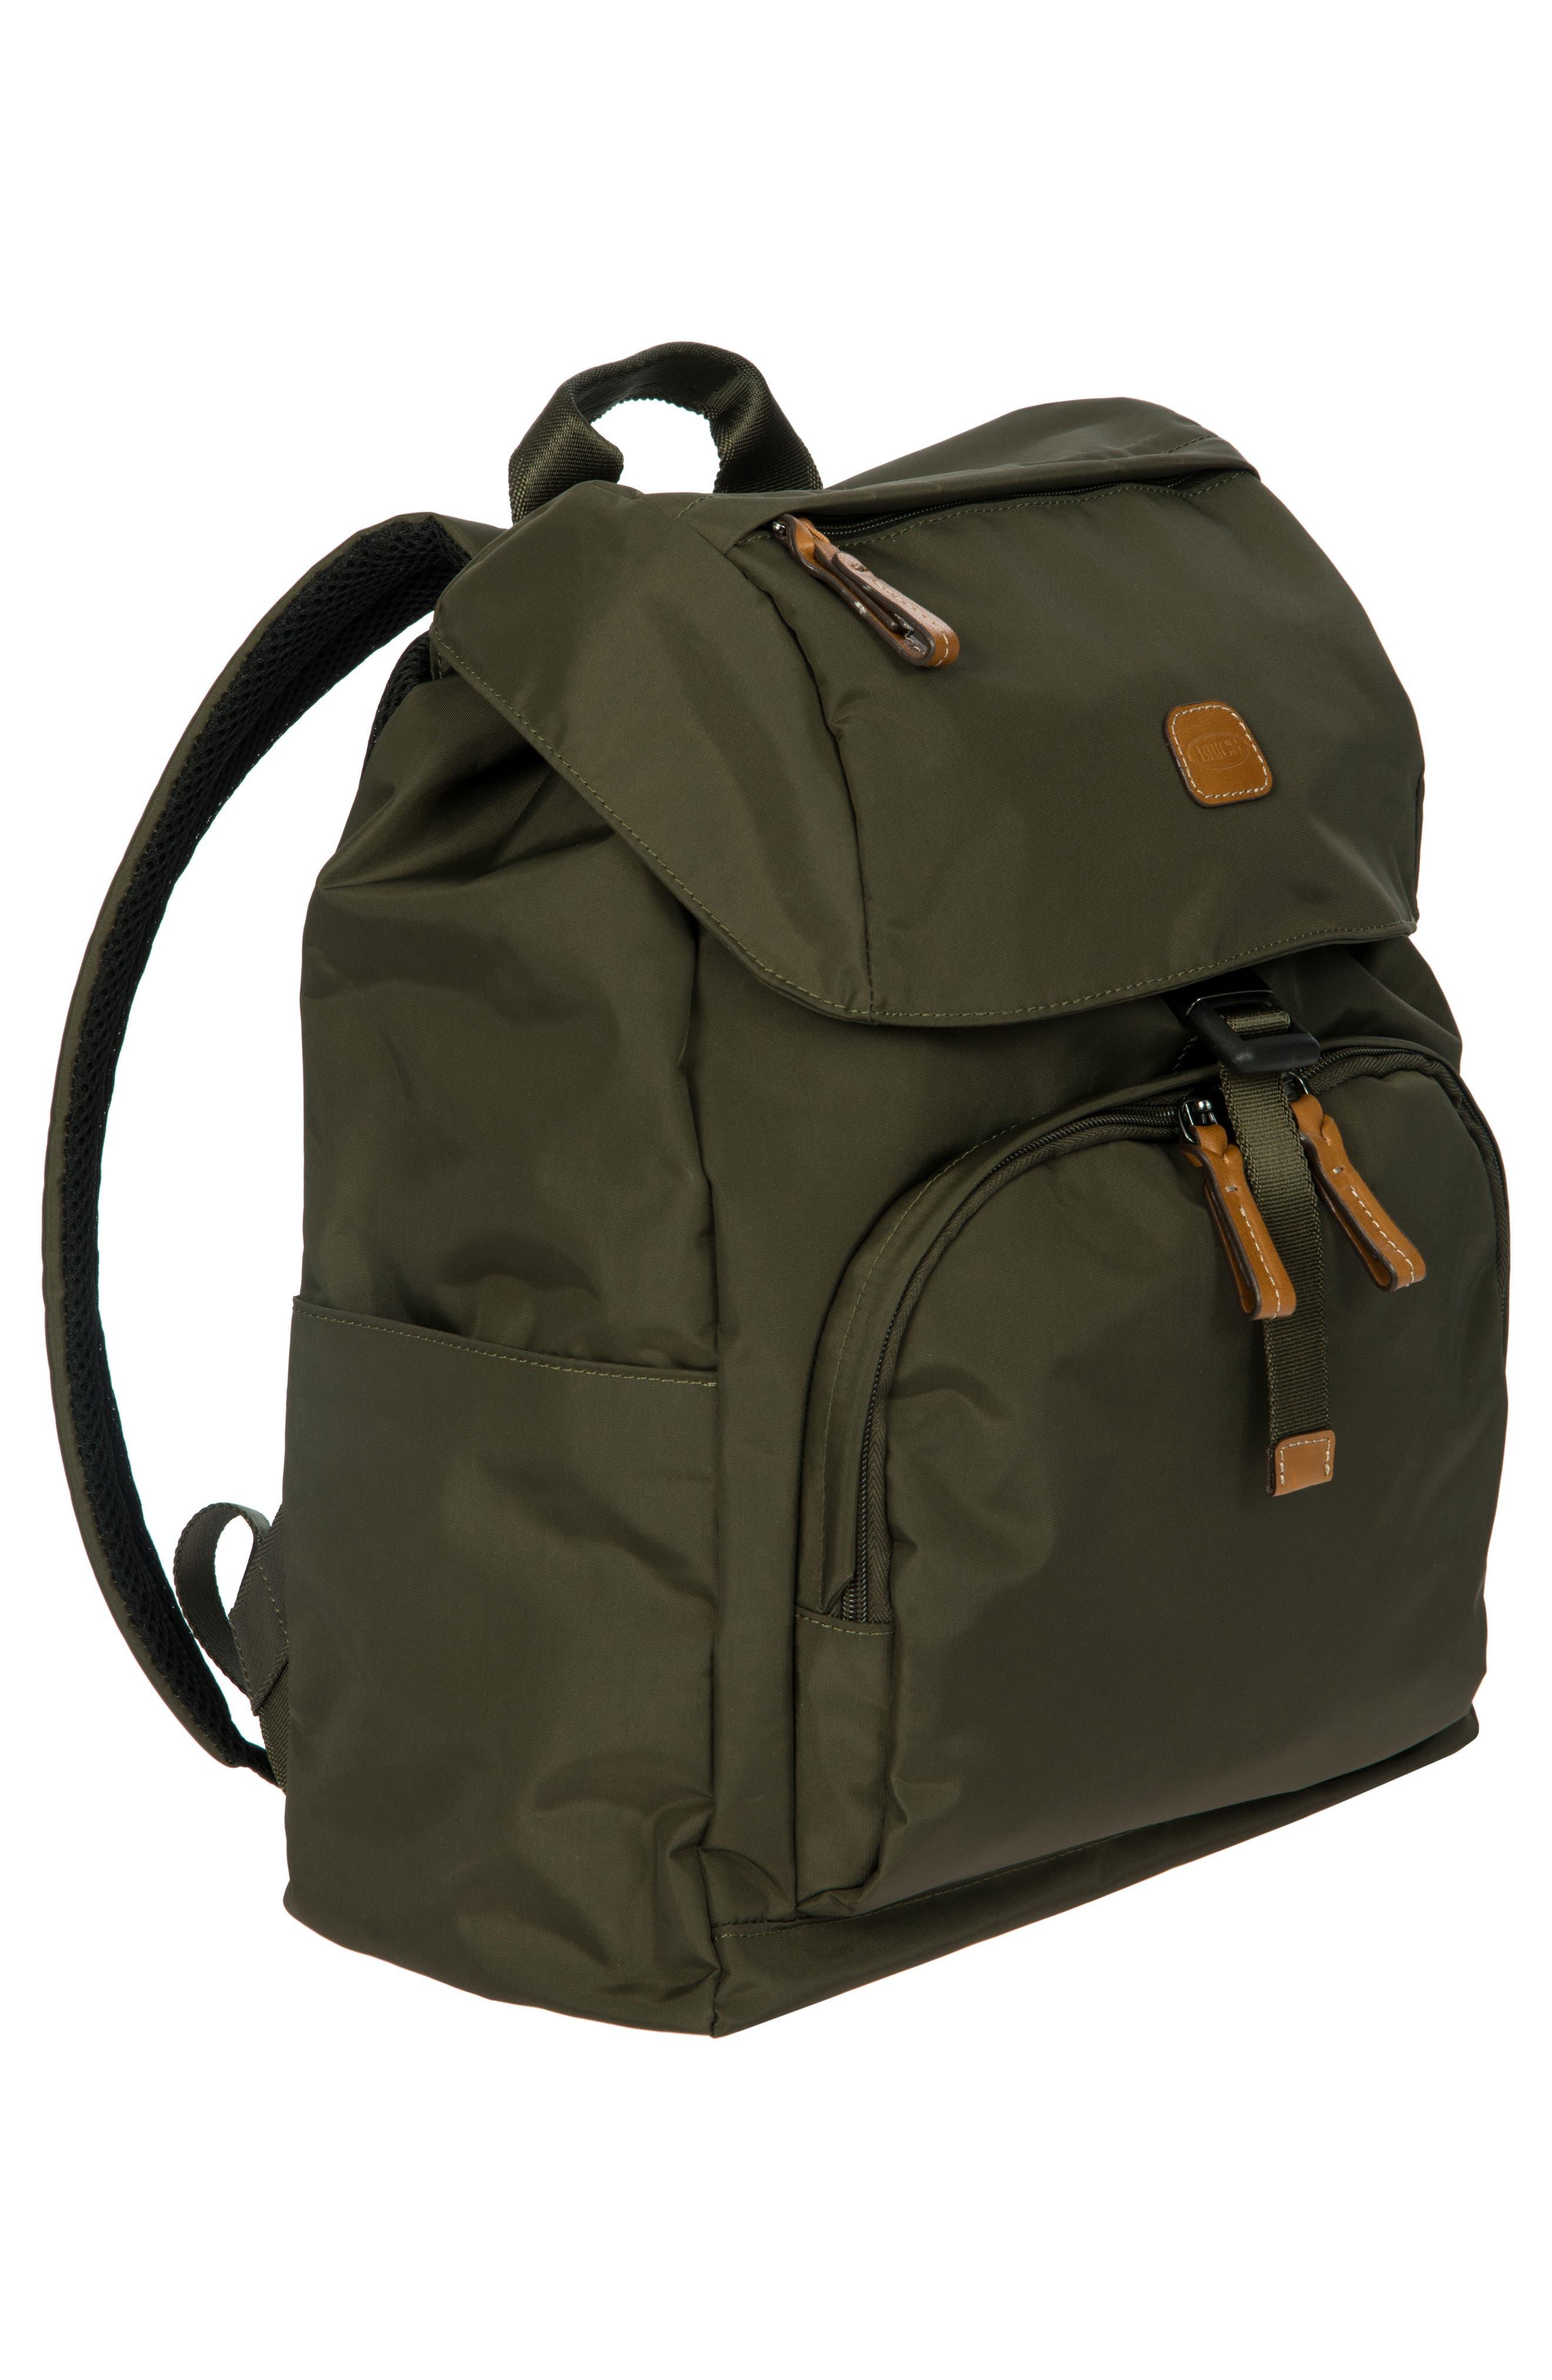 X-Bag Travel Excursion Backpack,                             Alternate thumbnail 6, color,                             Olive